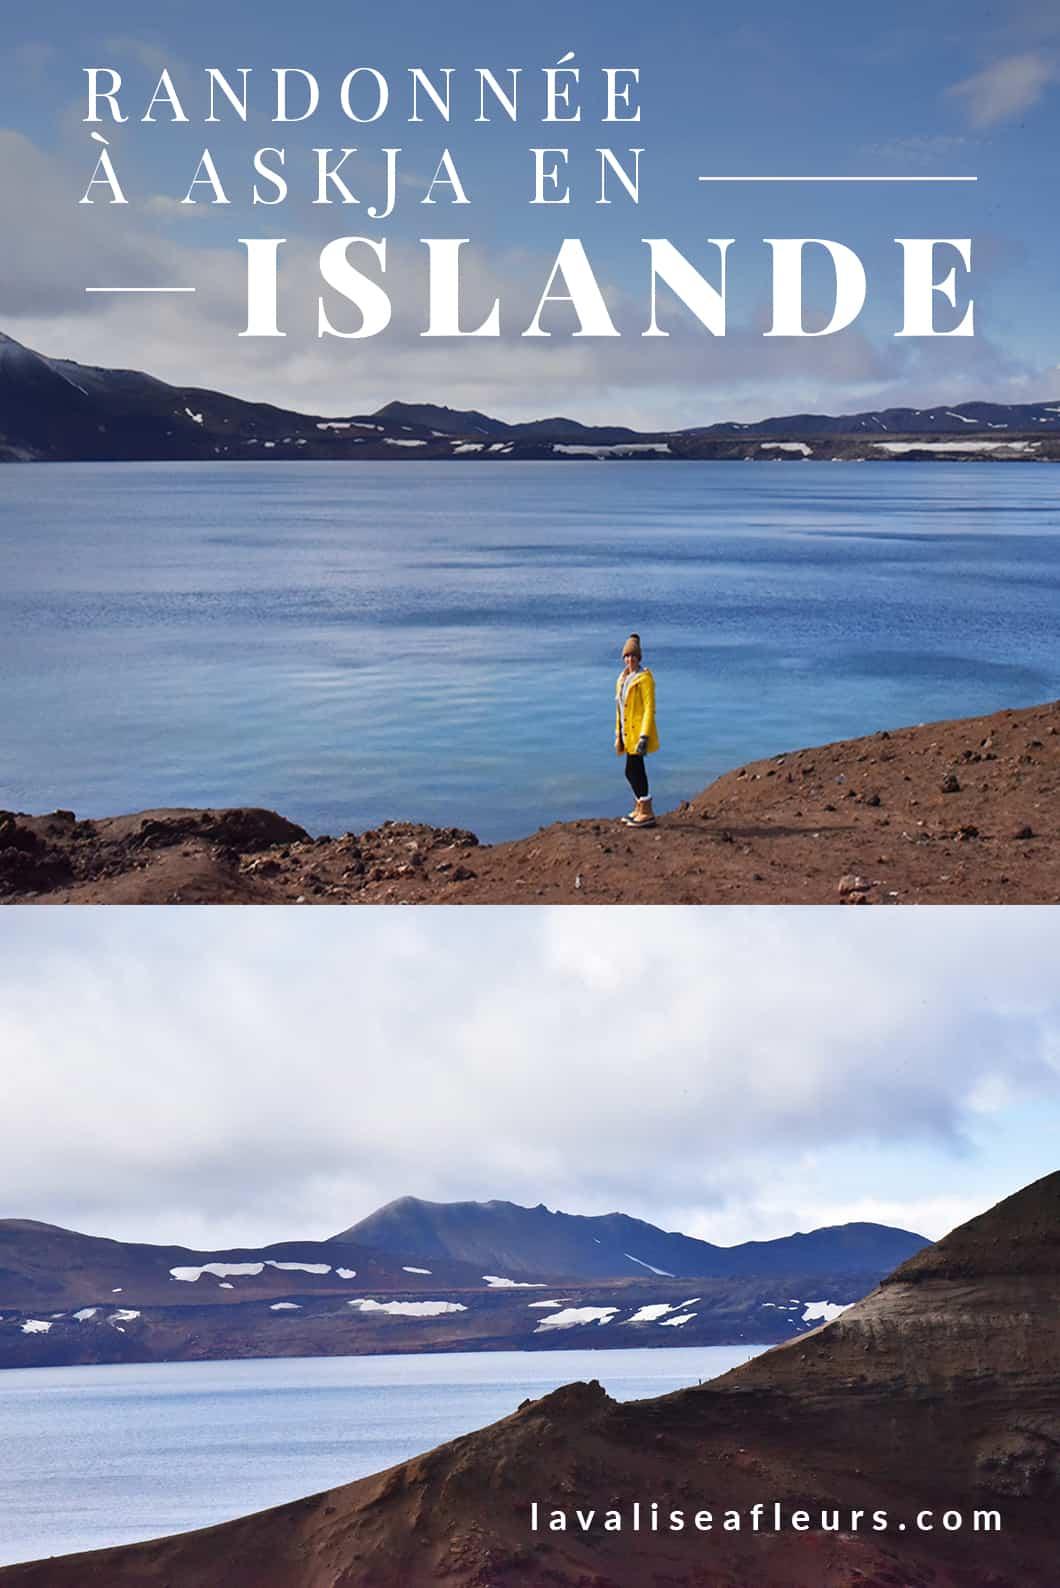 Les plus belles randonnées en Islande, Askja